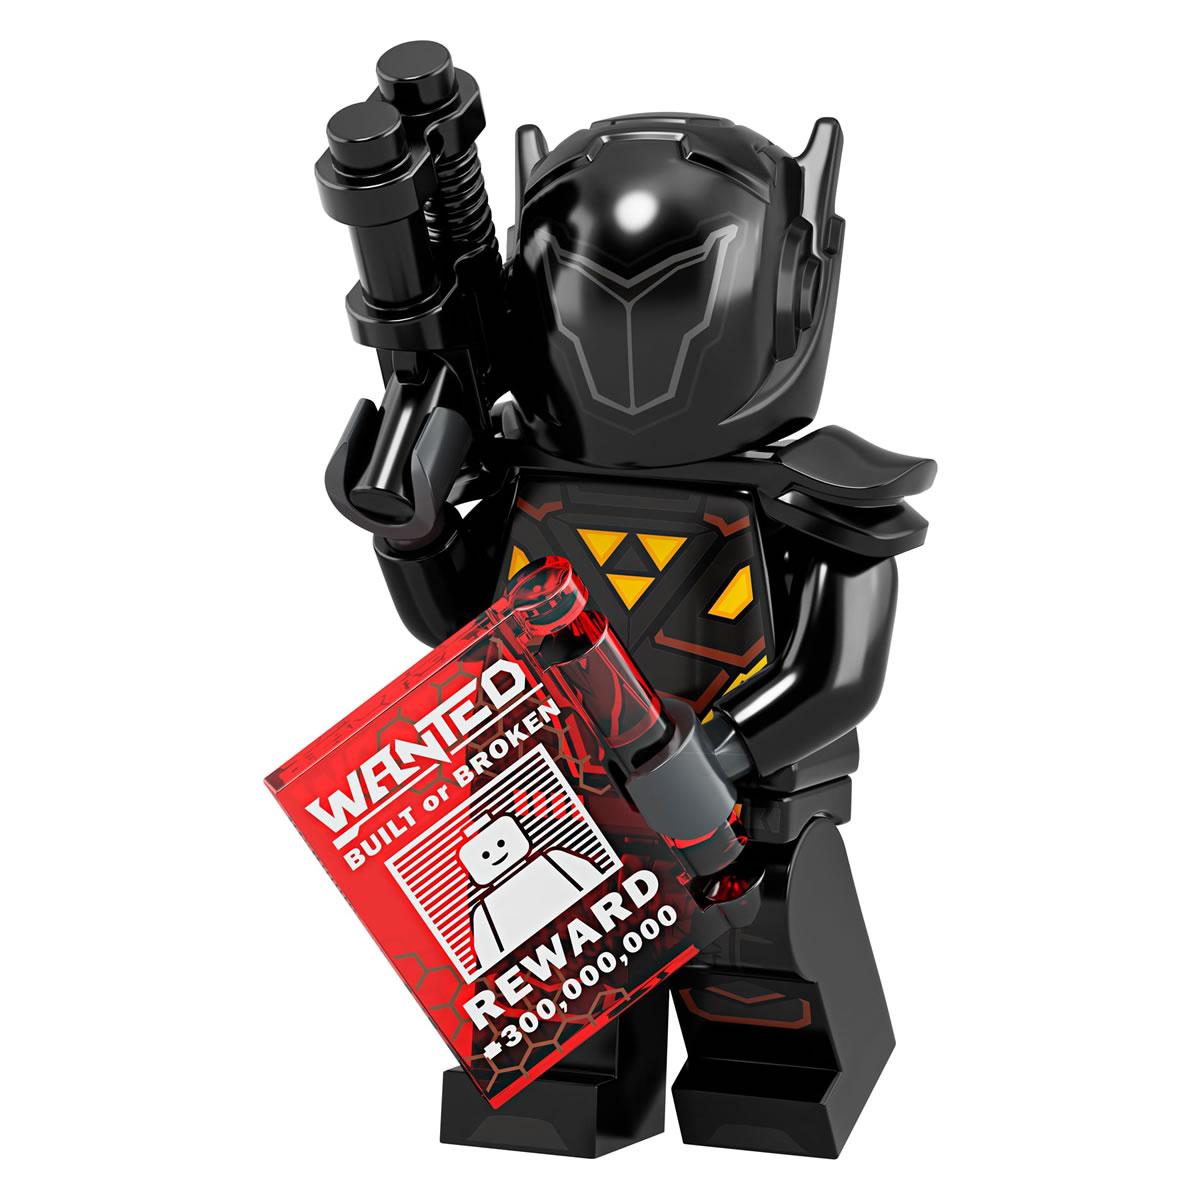 lego-minifiguren-sammelserie-collectible-minifigures-serie-19-71025-2019-15 zusammengebaut.com